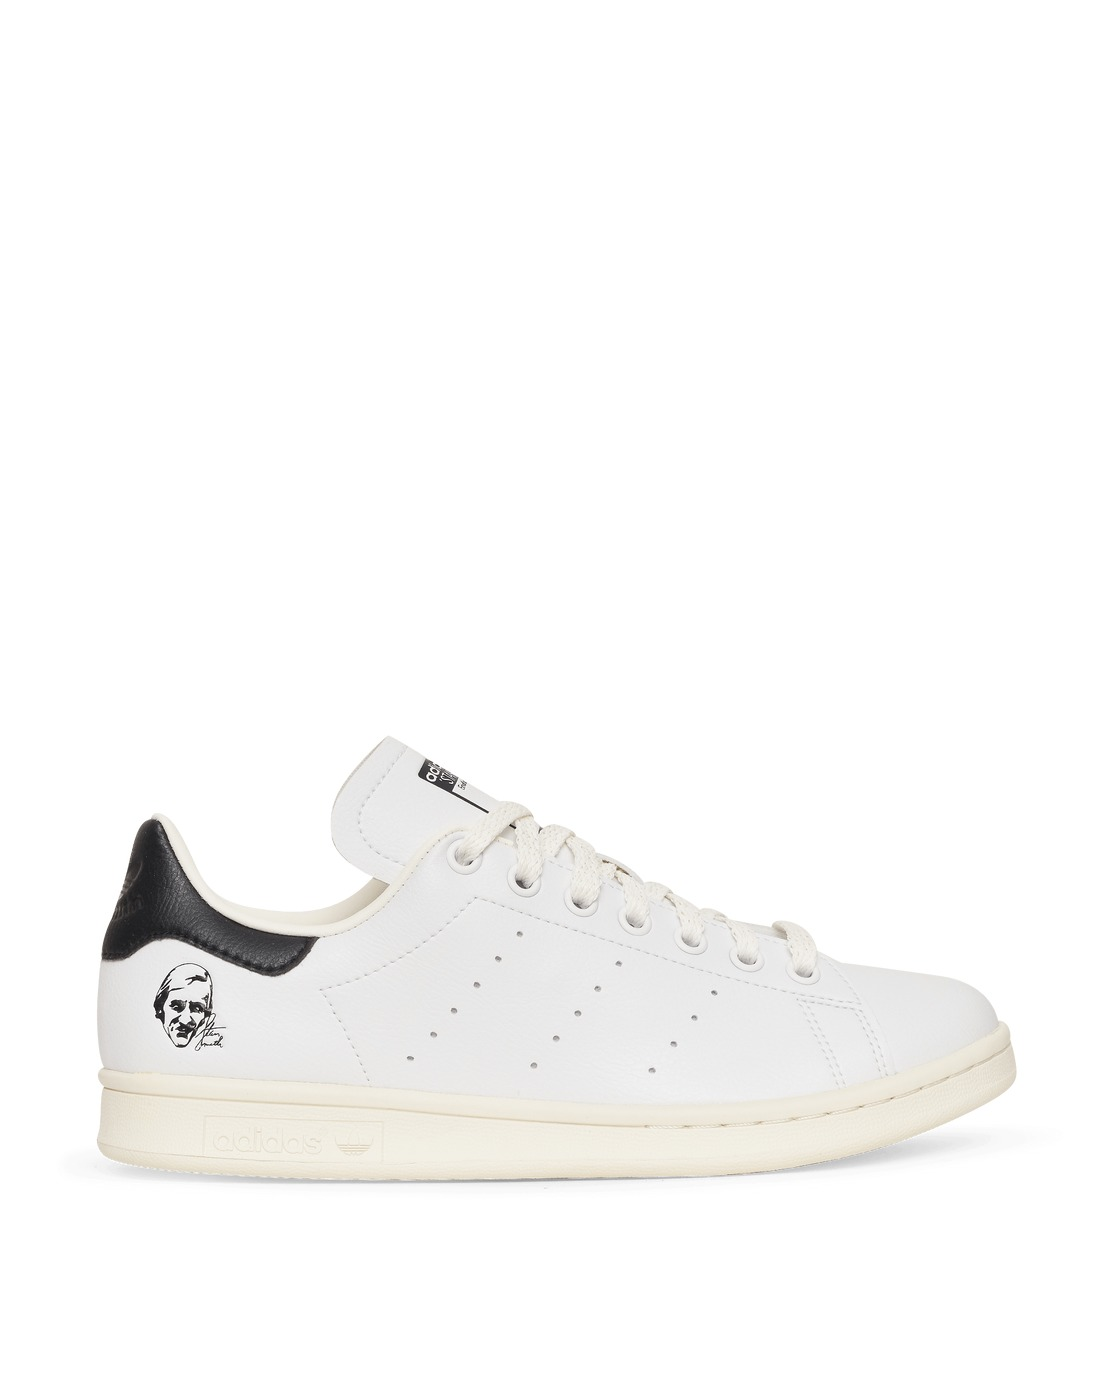 Adidas Originals Stan Smith Sneakers Off White/Ftwr White